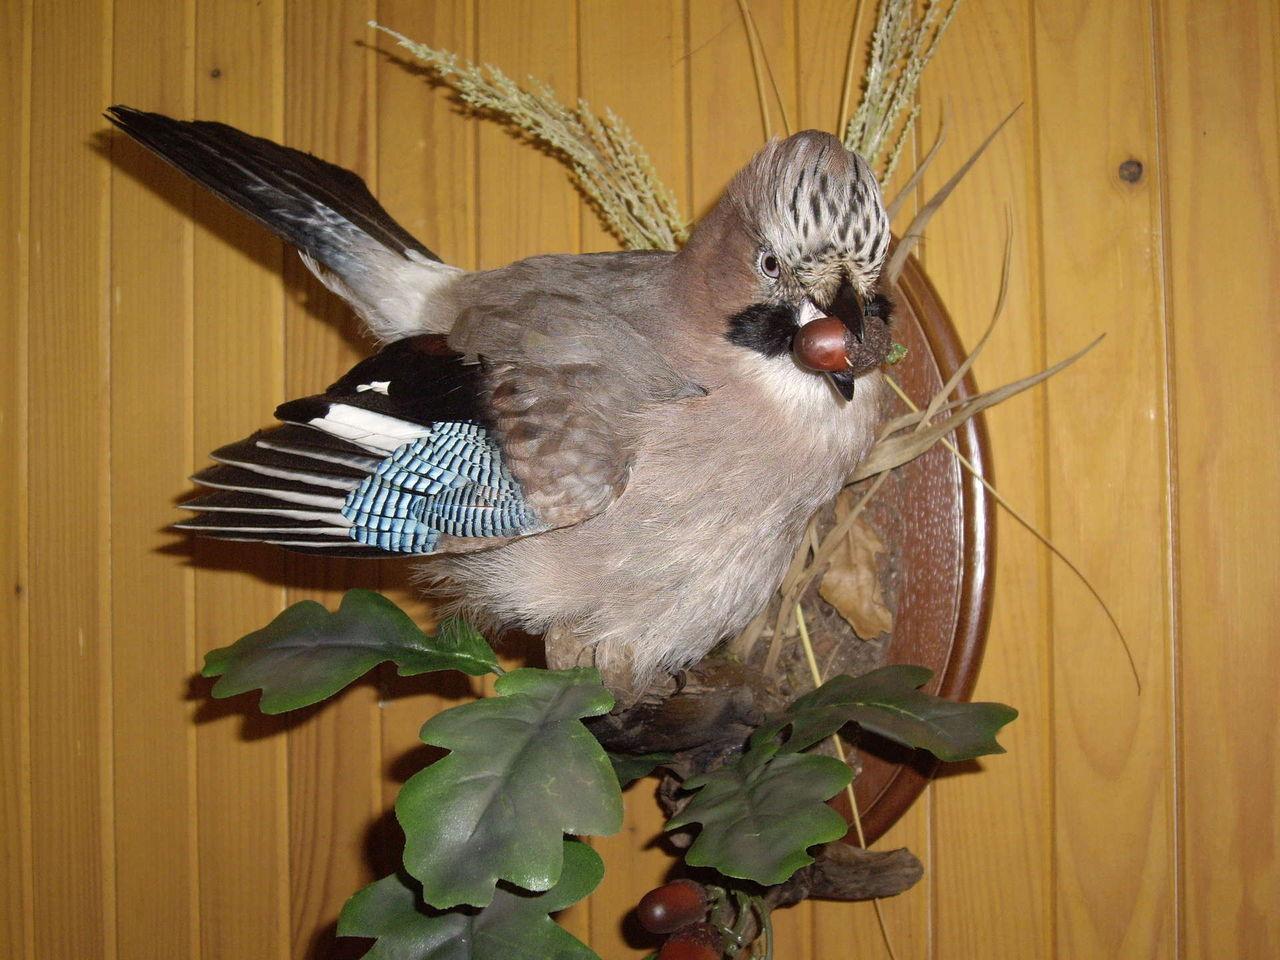 Сделать чучело птиц в домашних условиях